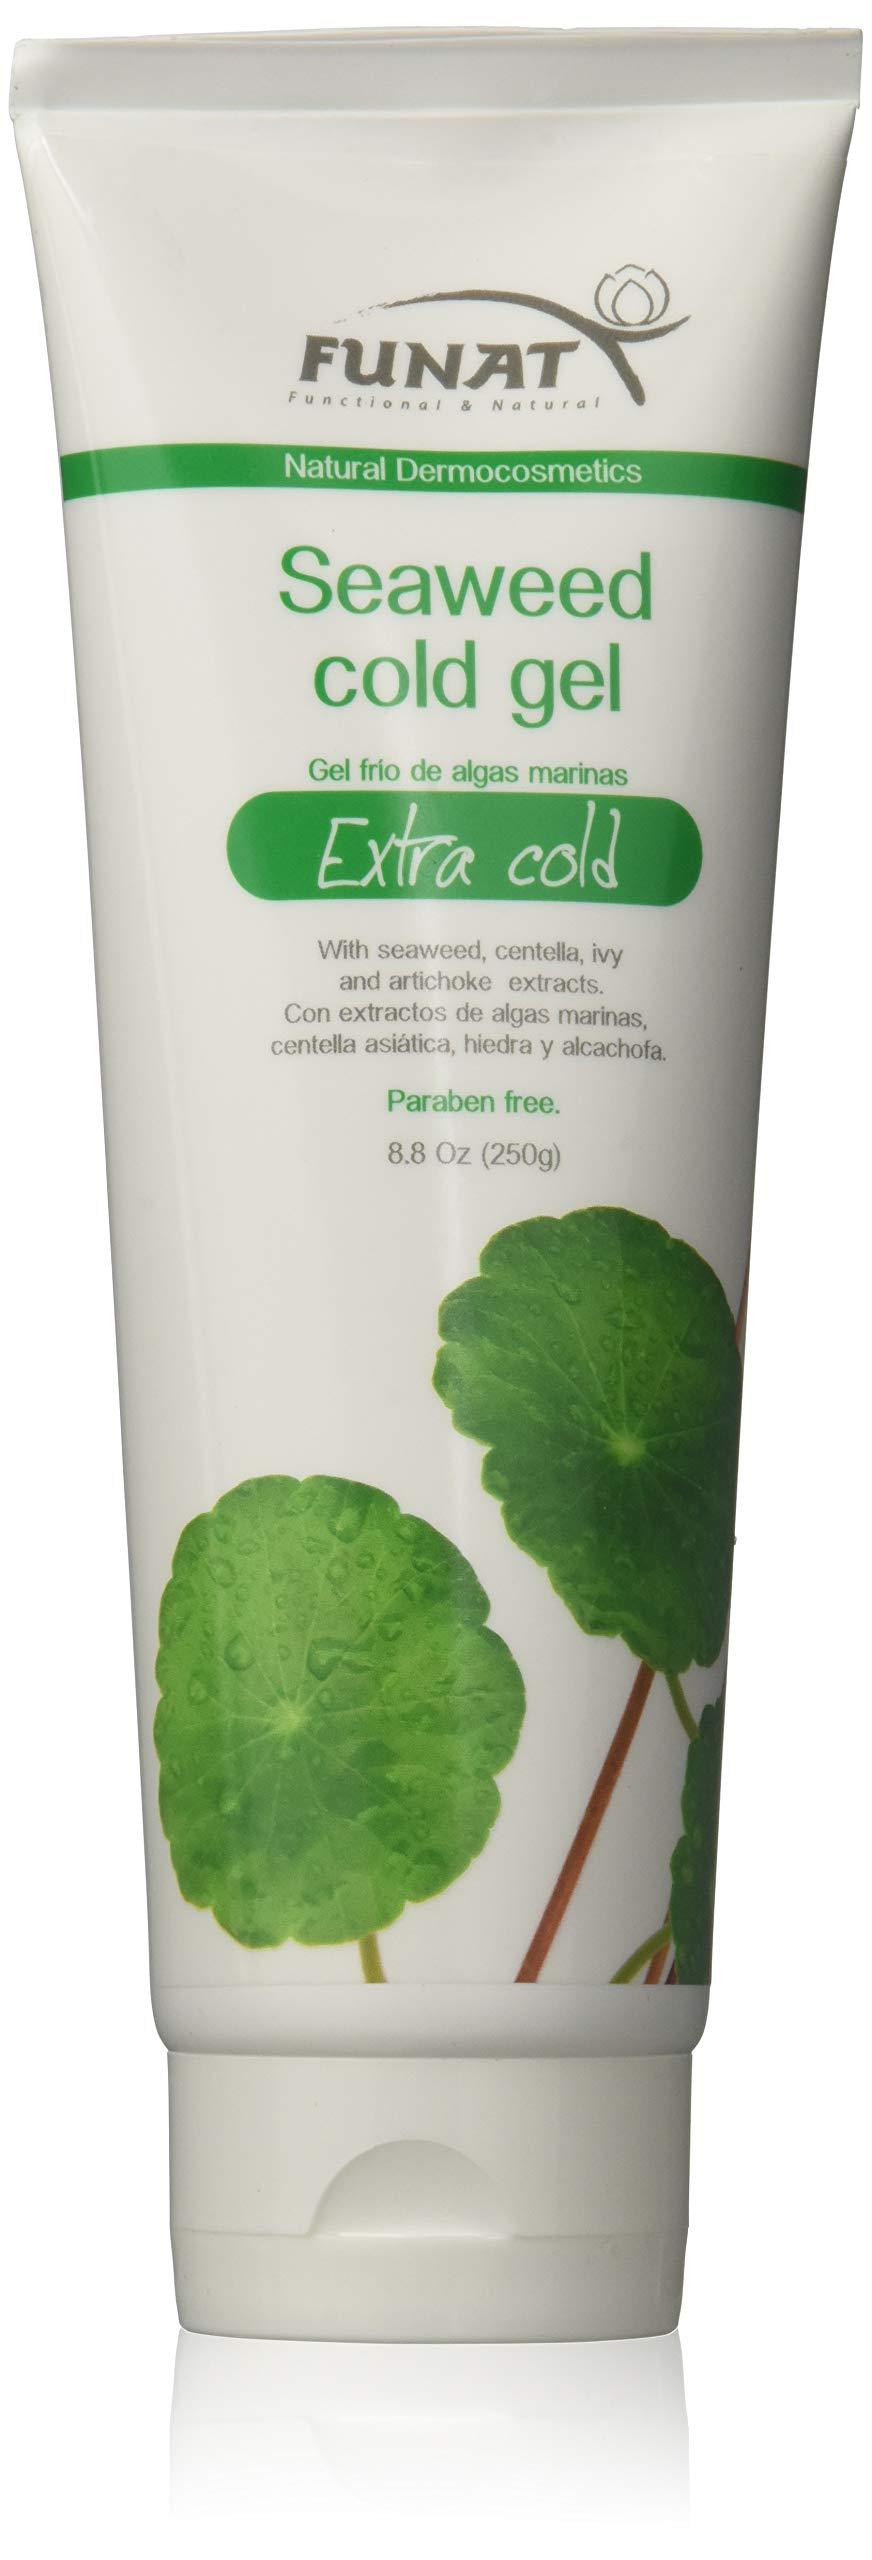 Funat Anti-Cellulite Slimming Cold Body Scrub Gel Reductor Quema Grasa 250g 8.8 Oz